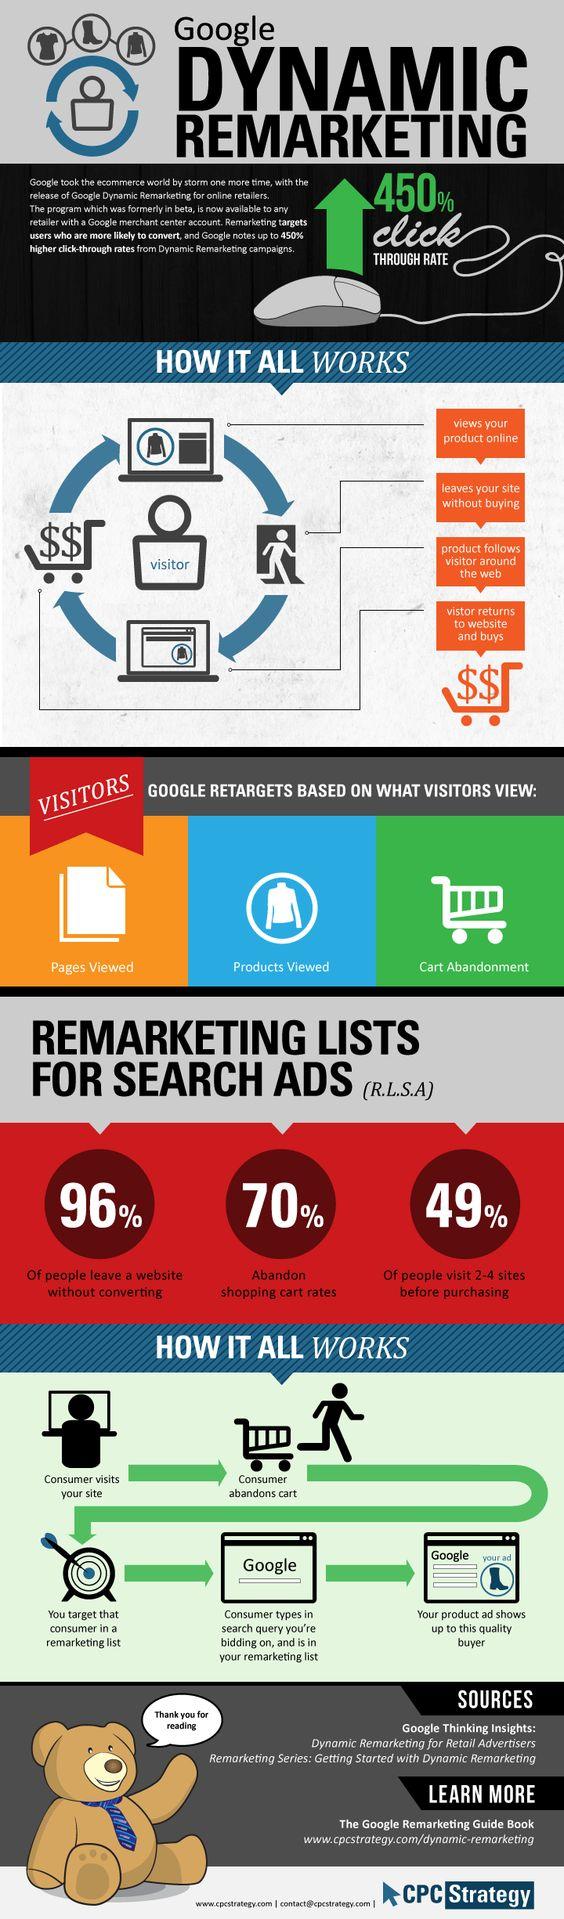 Google Dynamic Remarketing [Infographic] including RLSA